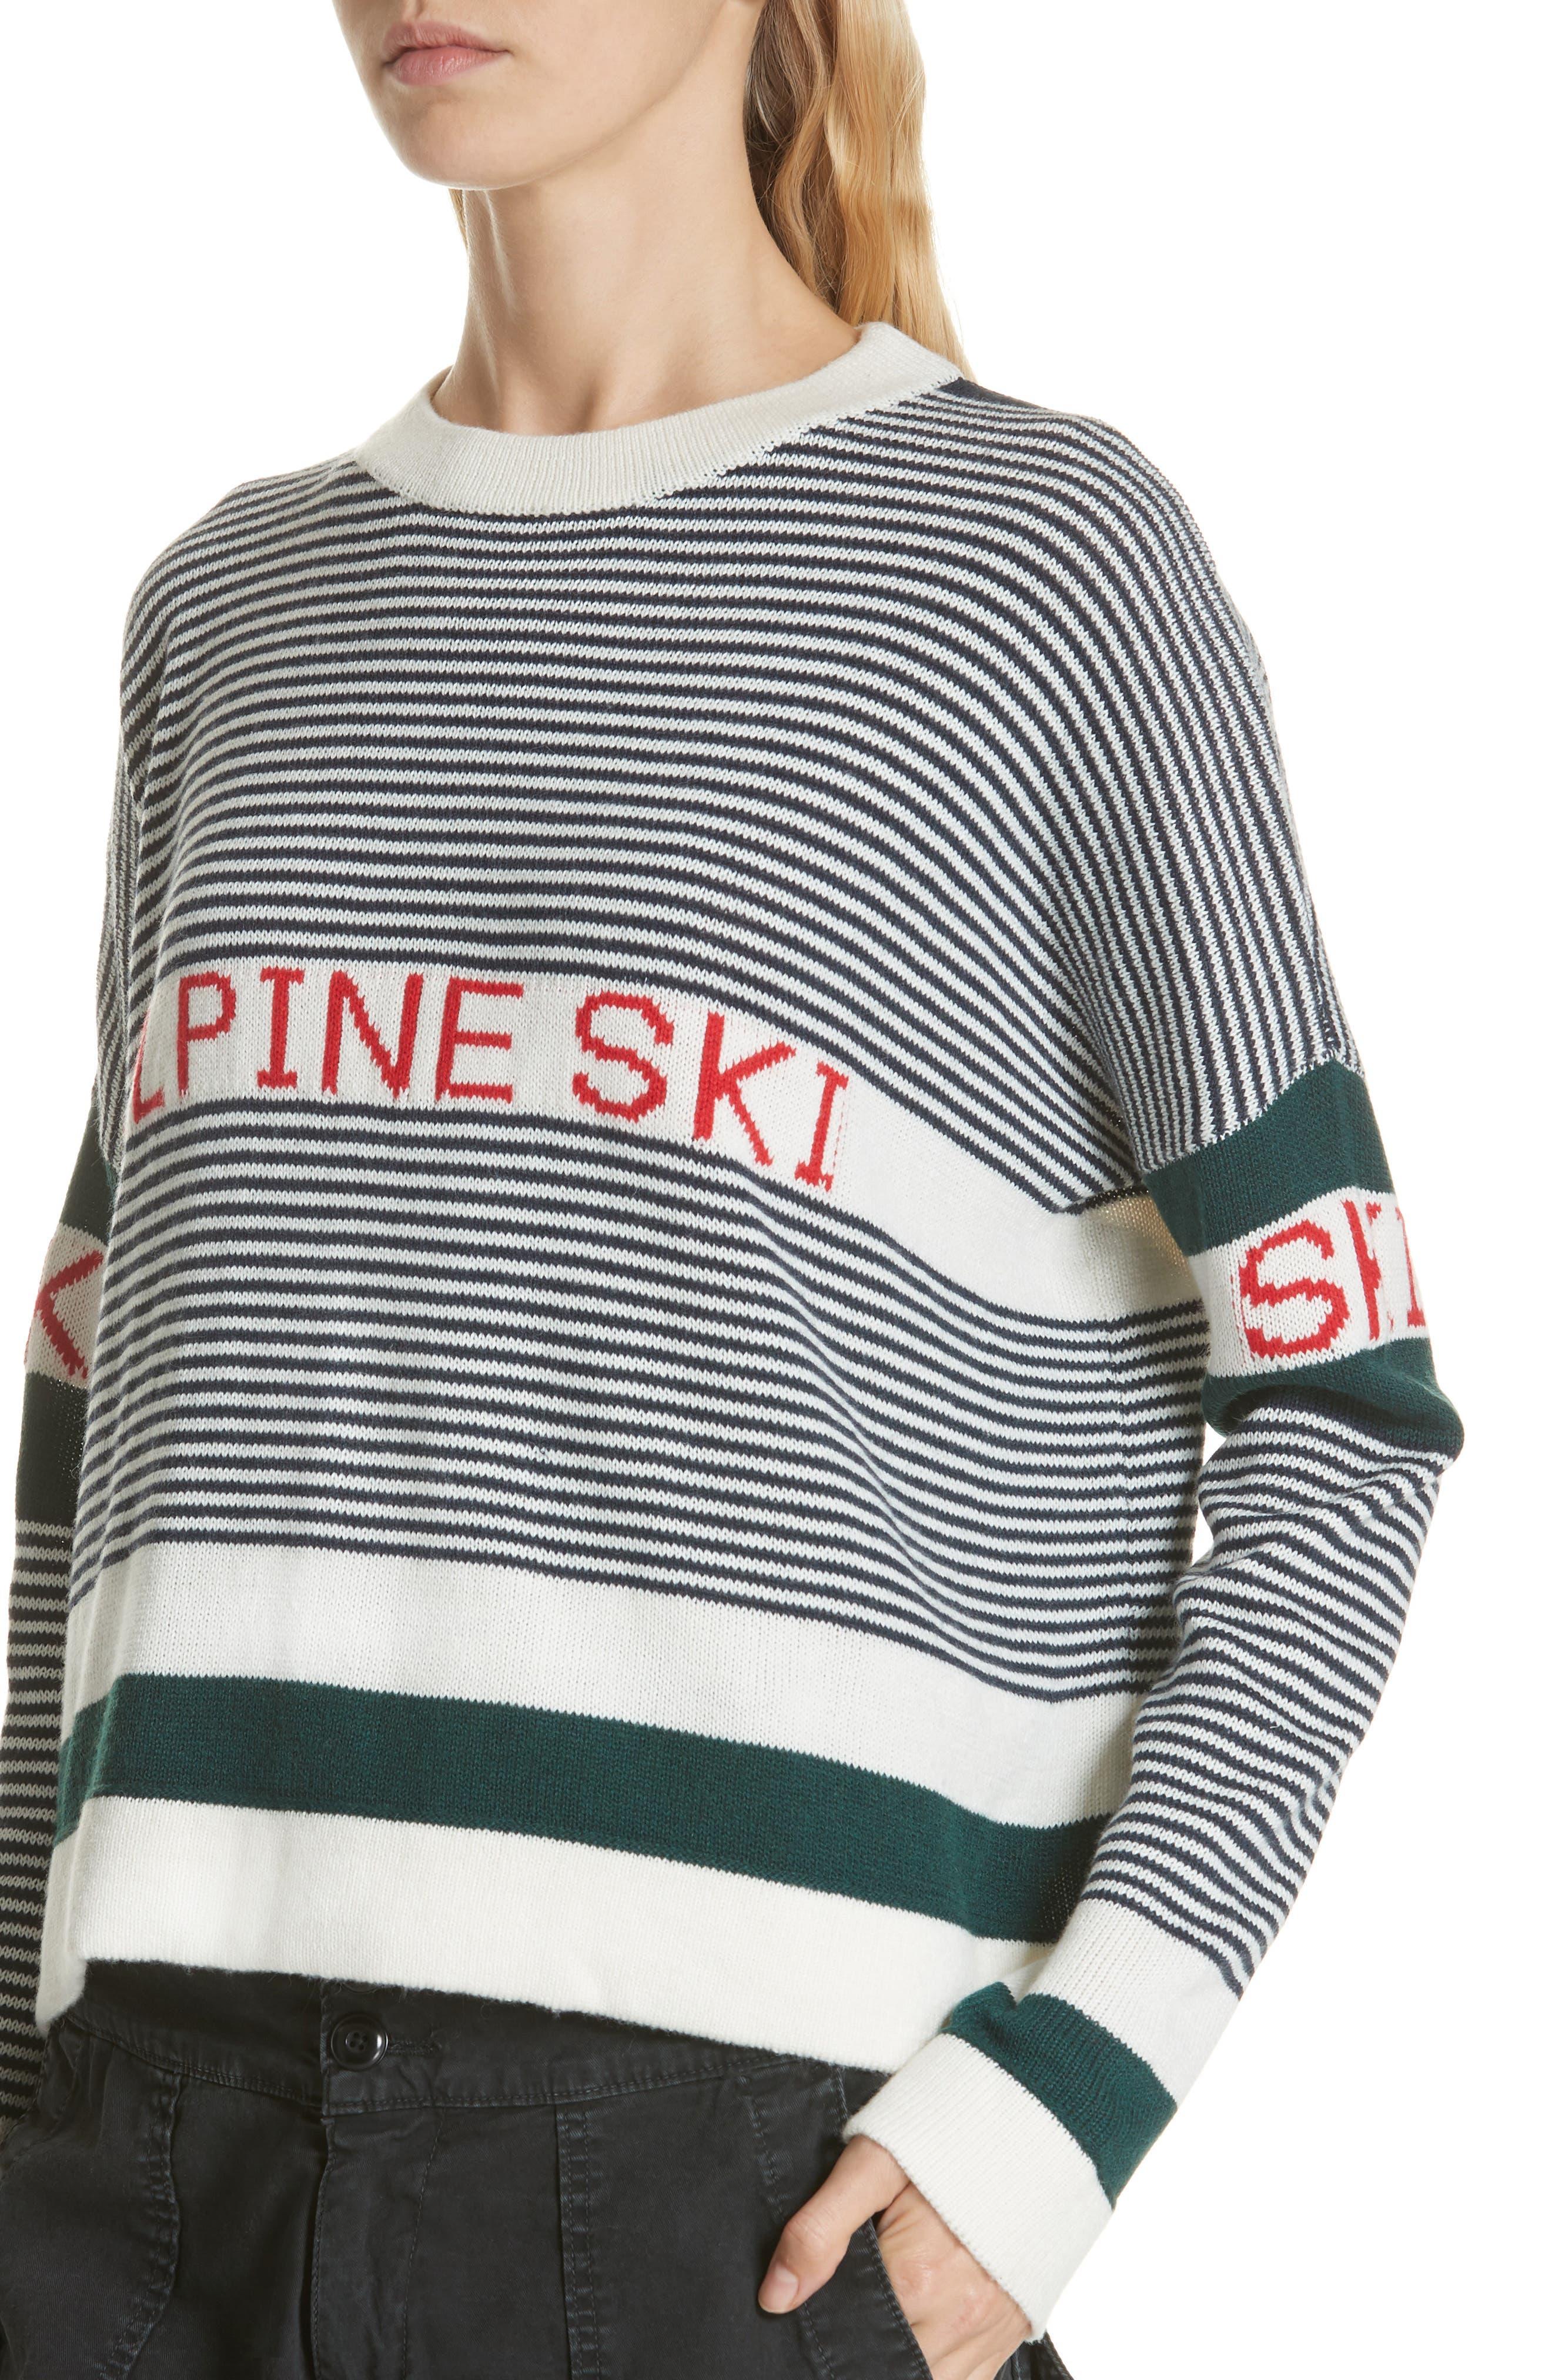 Alpine Ski Sweater,                             Alternate thumbnail 4, color,                             900